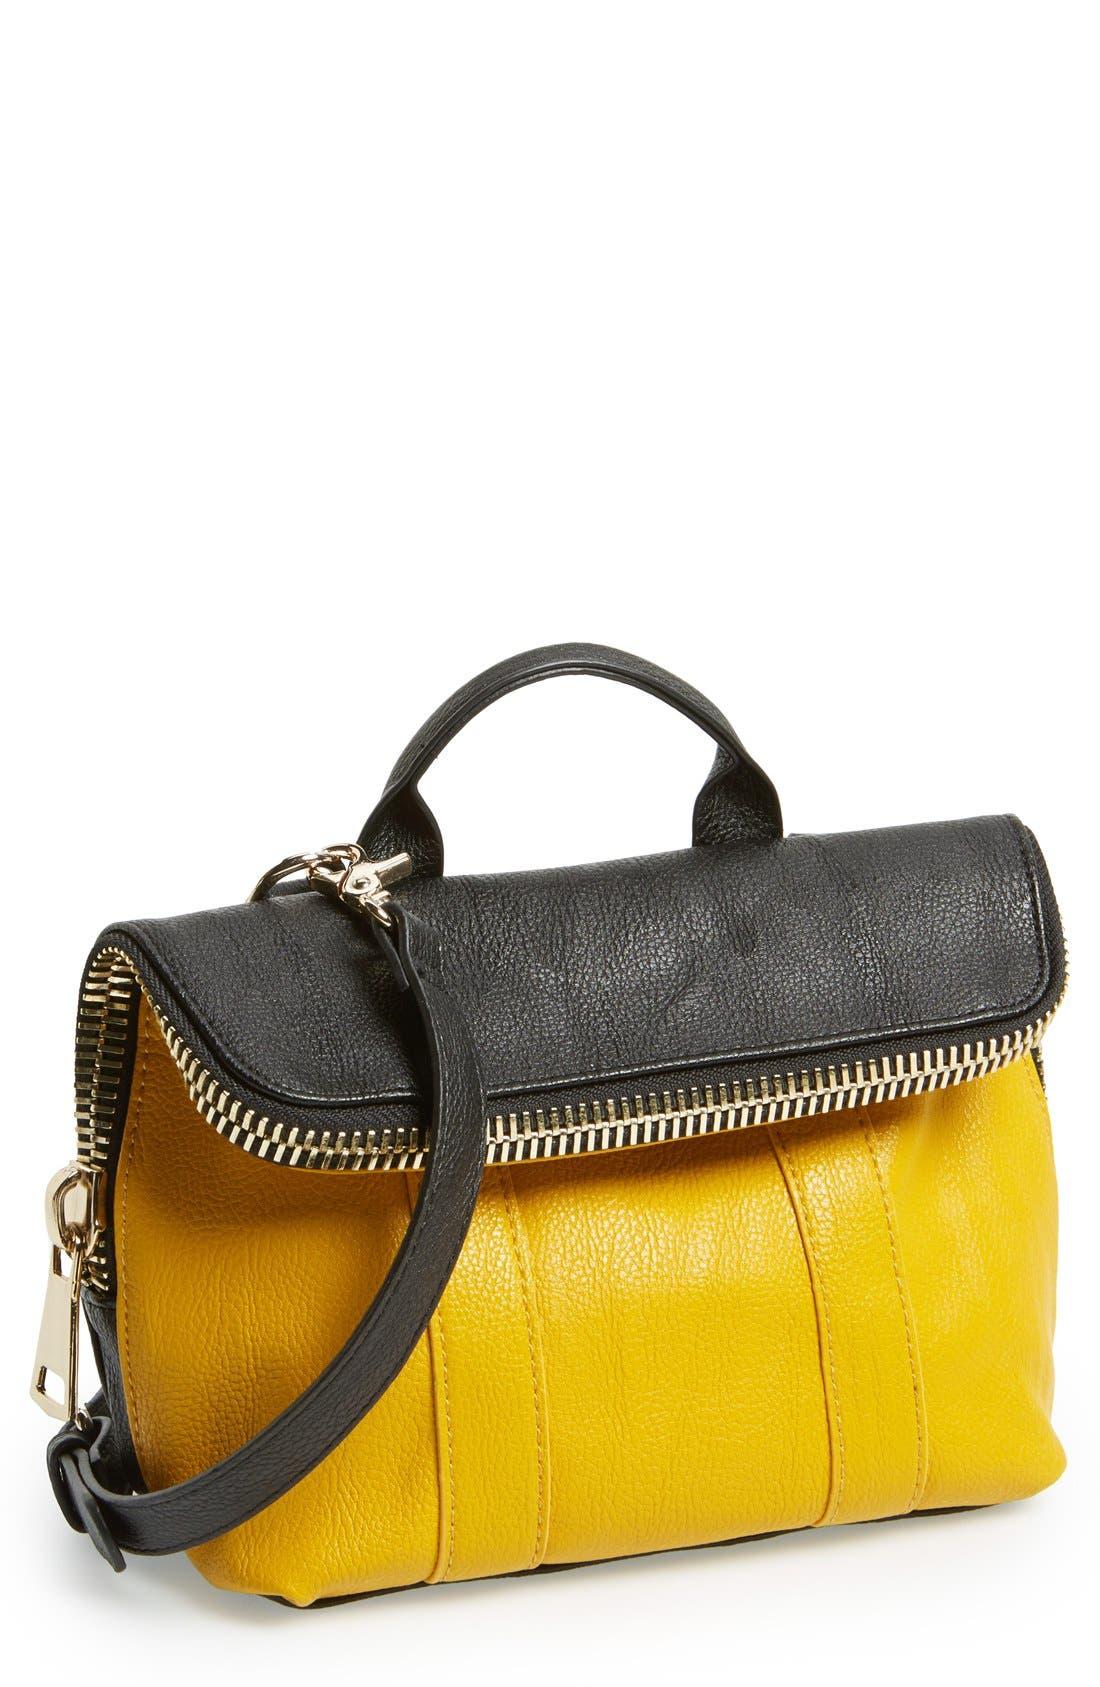 Main Image - POVERTY FLATS by rian 'Super' Zip Top Foldover Crossbody Bag